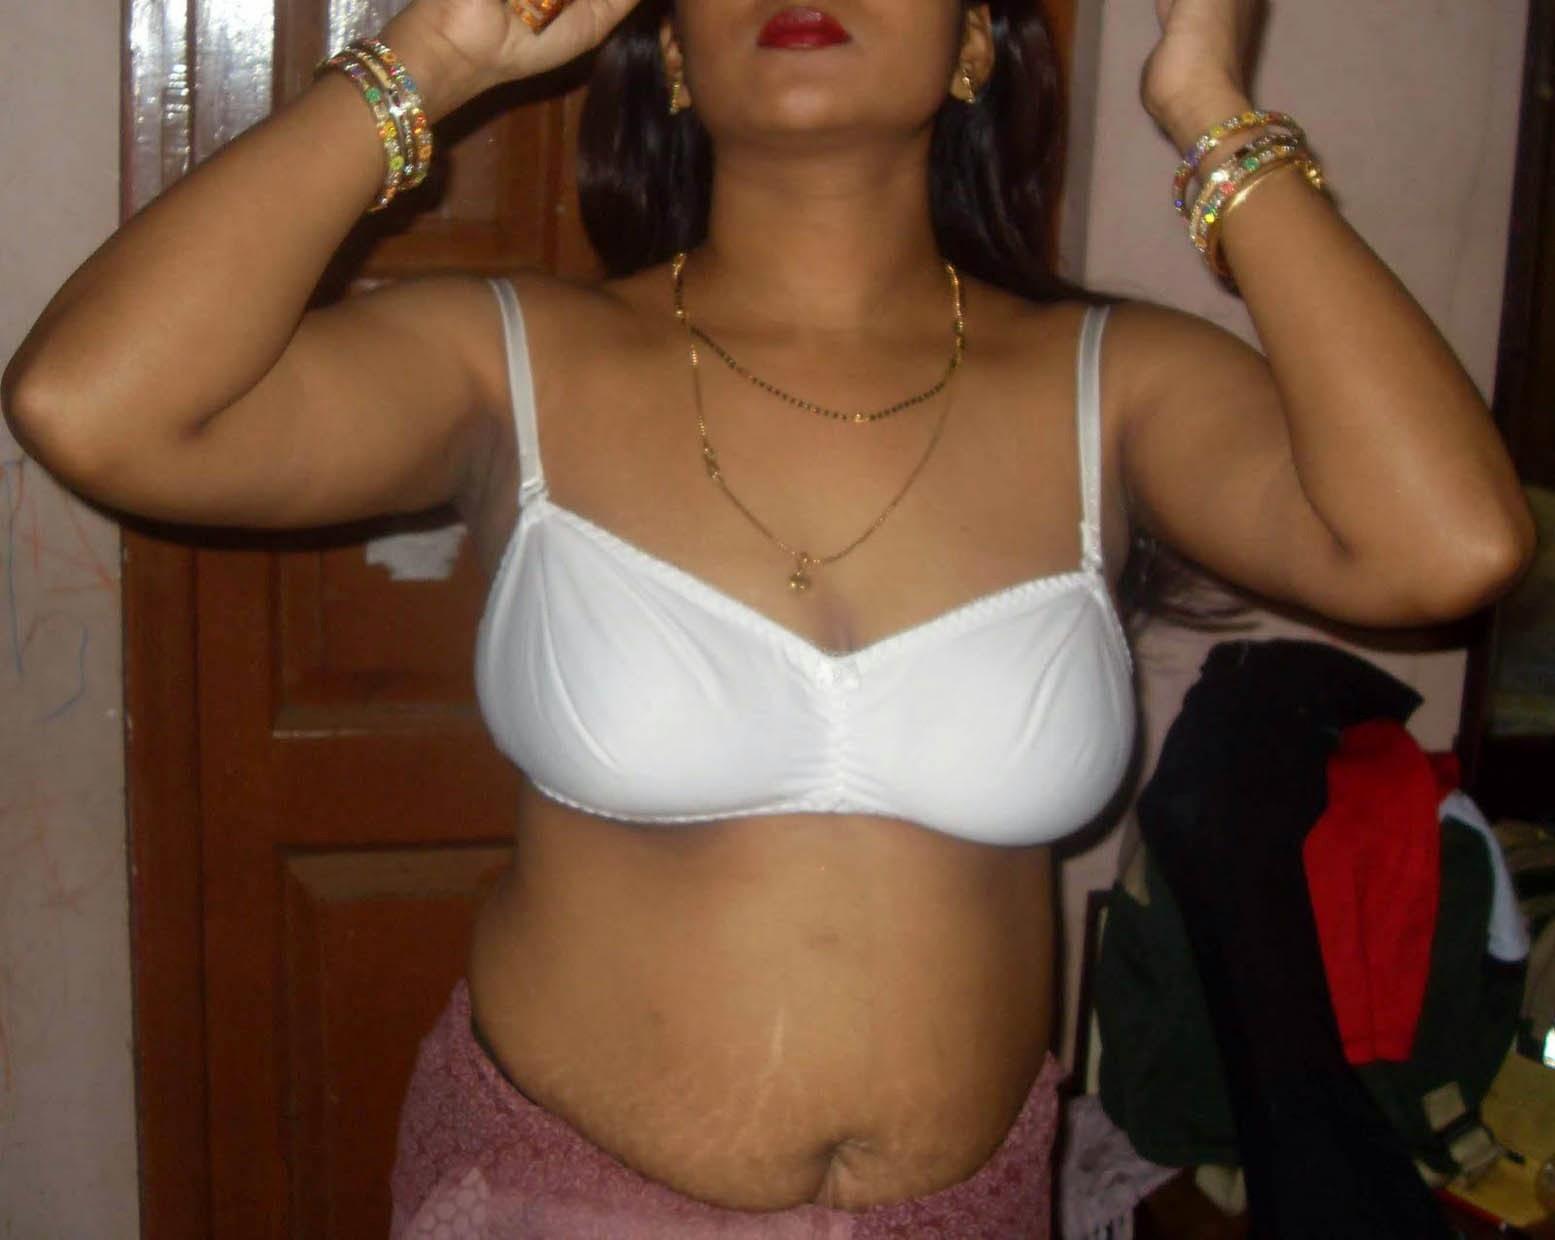 Hot Collection Of Desi Bhabhi Aunty And Girl Sex Kolkata -1539